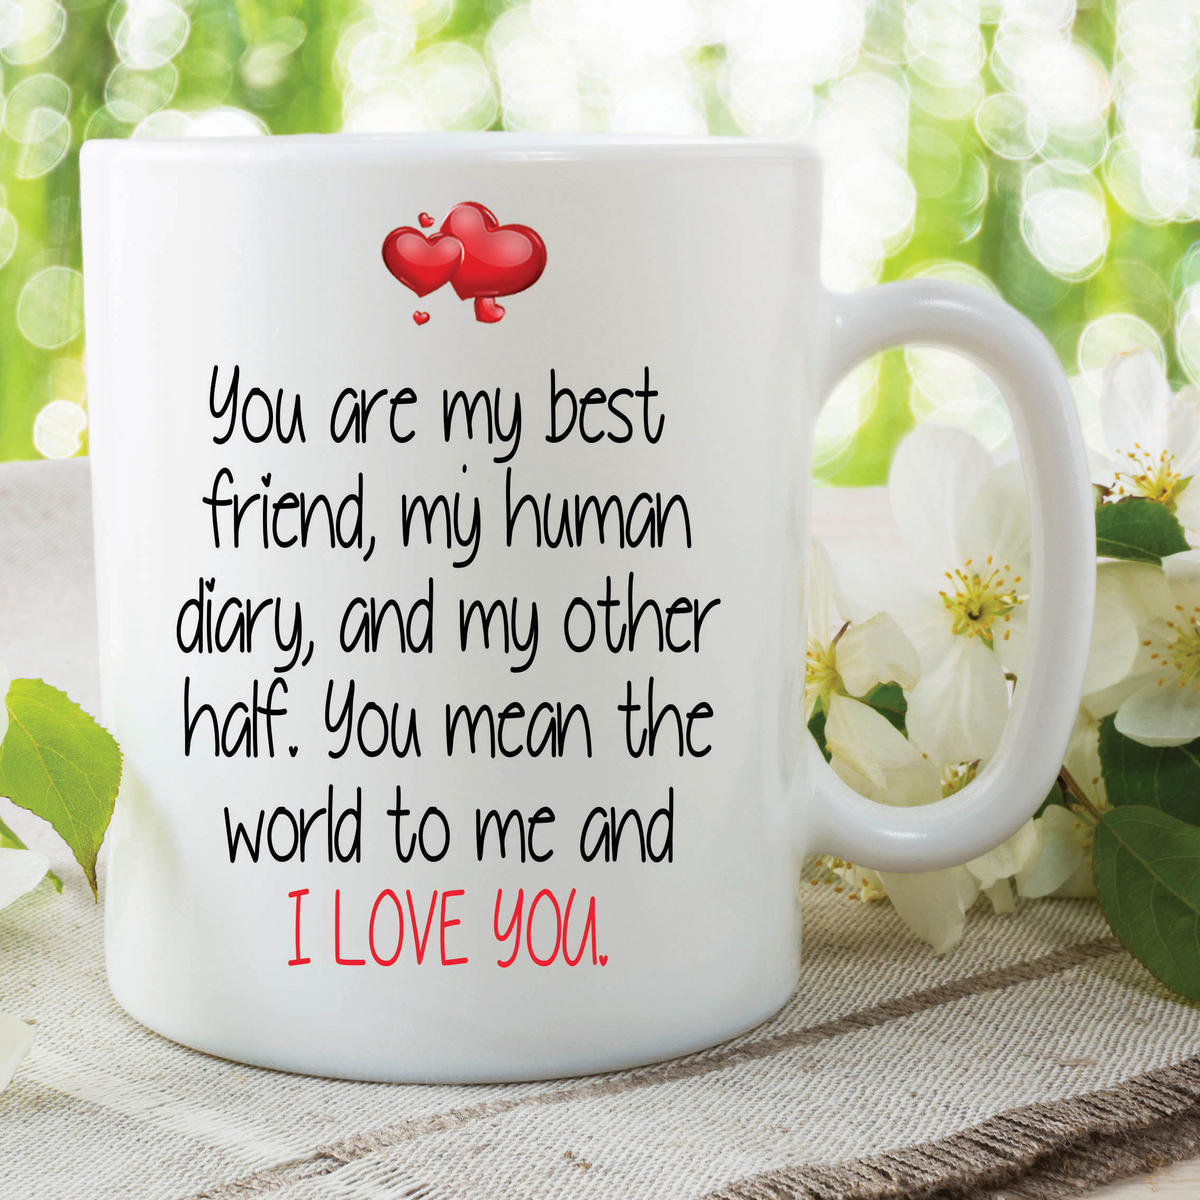 Funny Novelty Mugs I Love You Best Friend Girlfriend Boyfriend Cups WSDMUG625